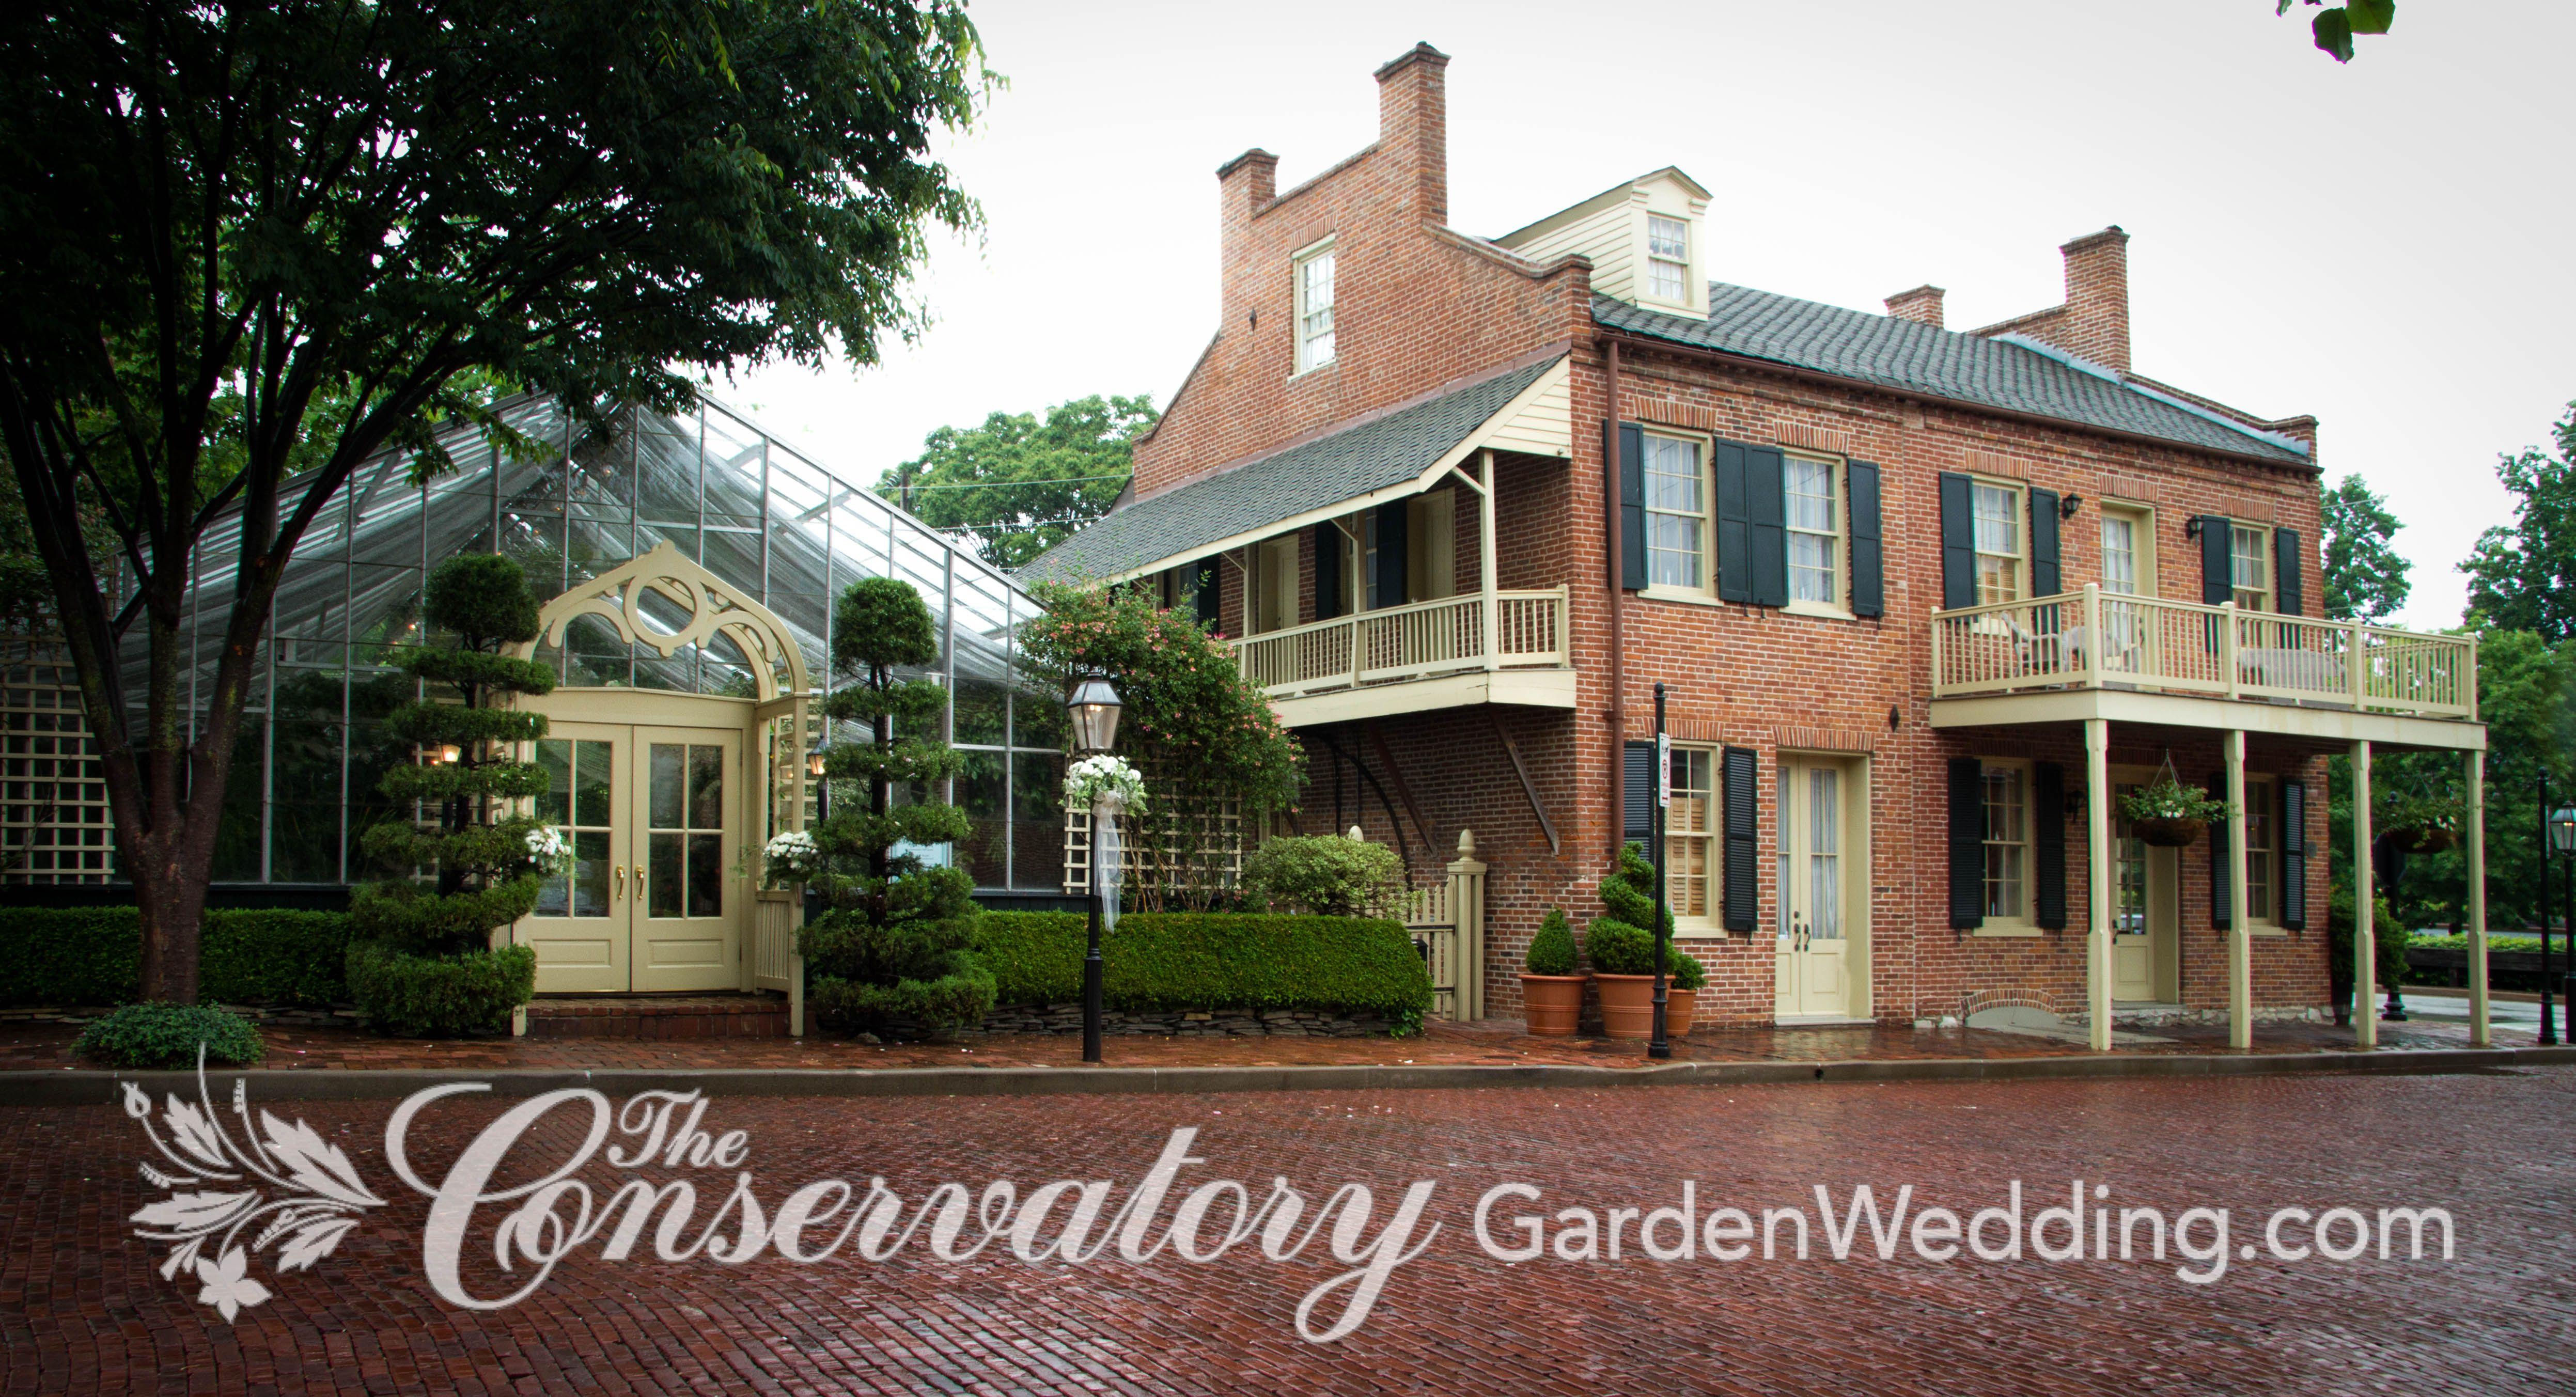 The Conservatory Garden Wedding Venue The Conservatory Conservatory Website Gardenwedding Com Wedd Conservatory Garden Garden Wedding Venue Conservatory